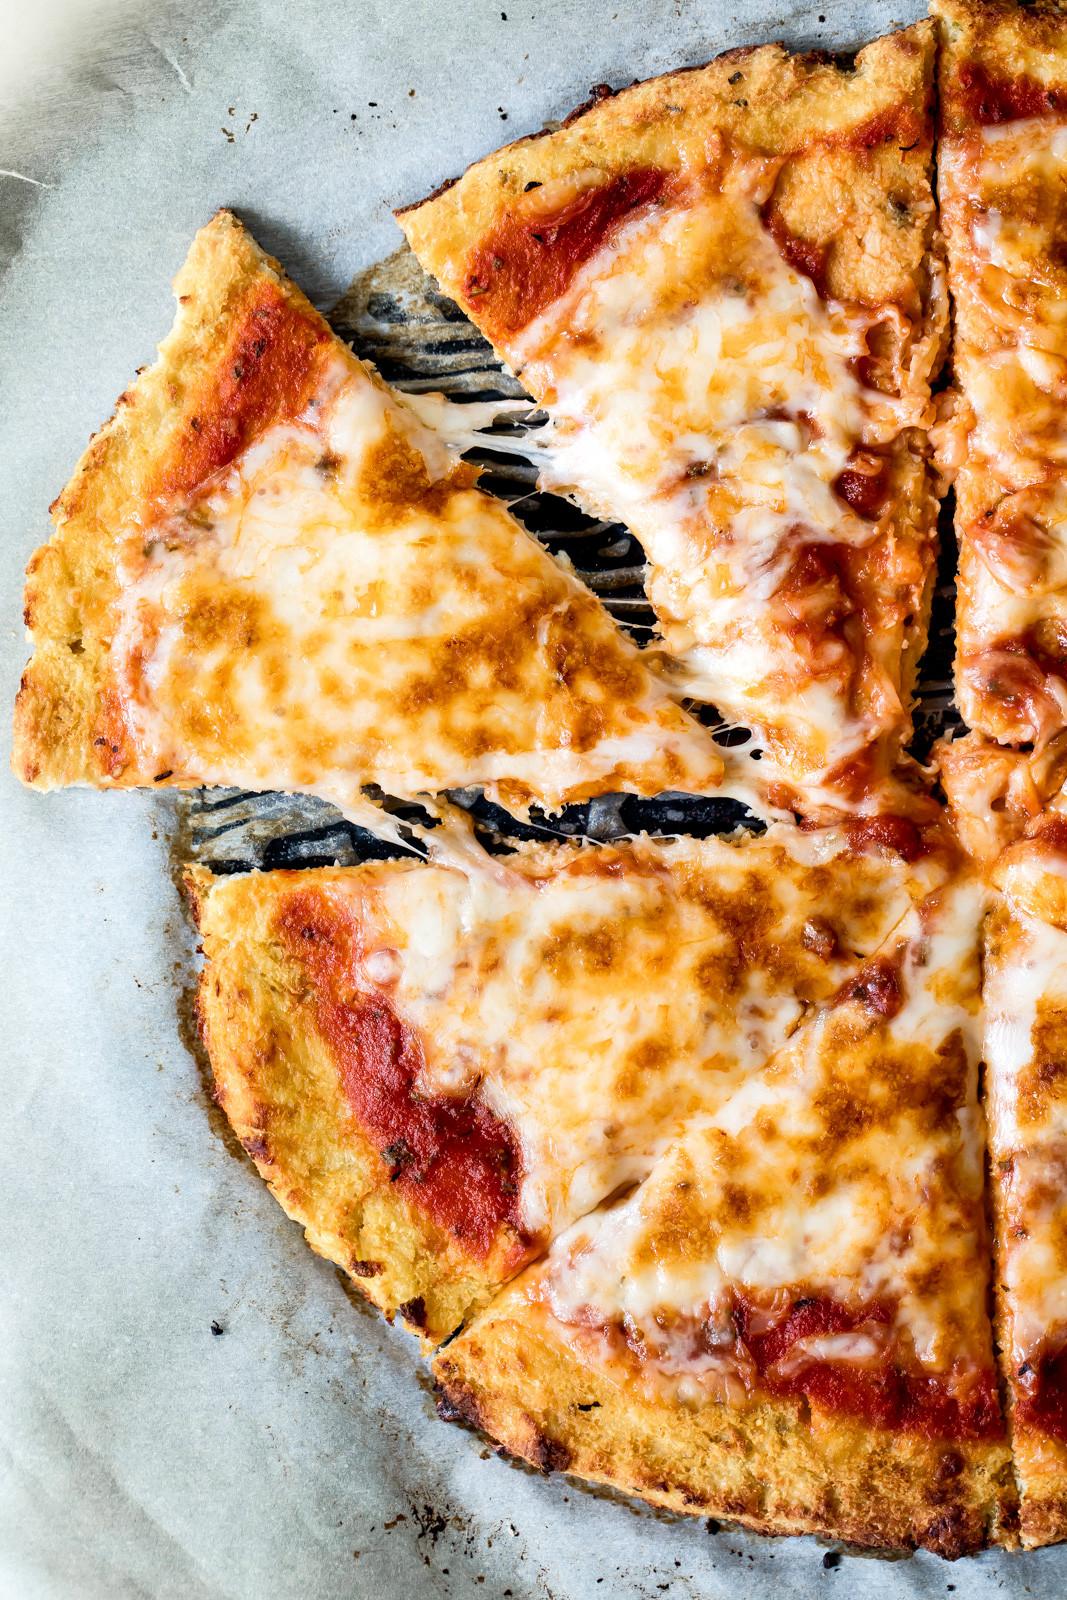 Where To Buy Cauliflower Pizza Crust  How to Make the Best Cauliflower Pizza Crust video